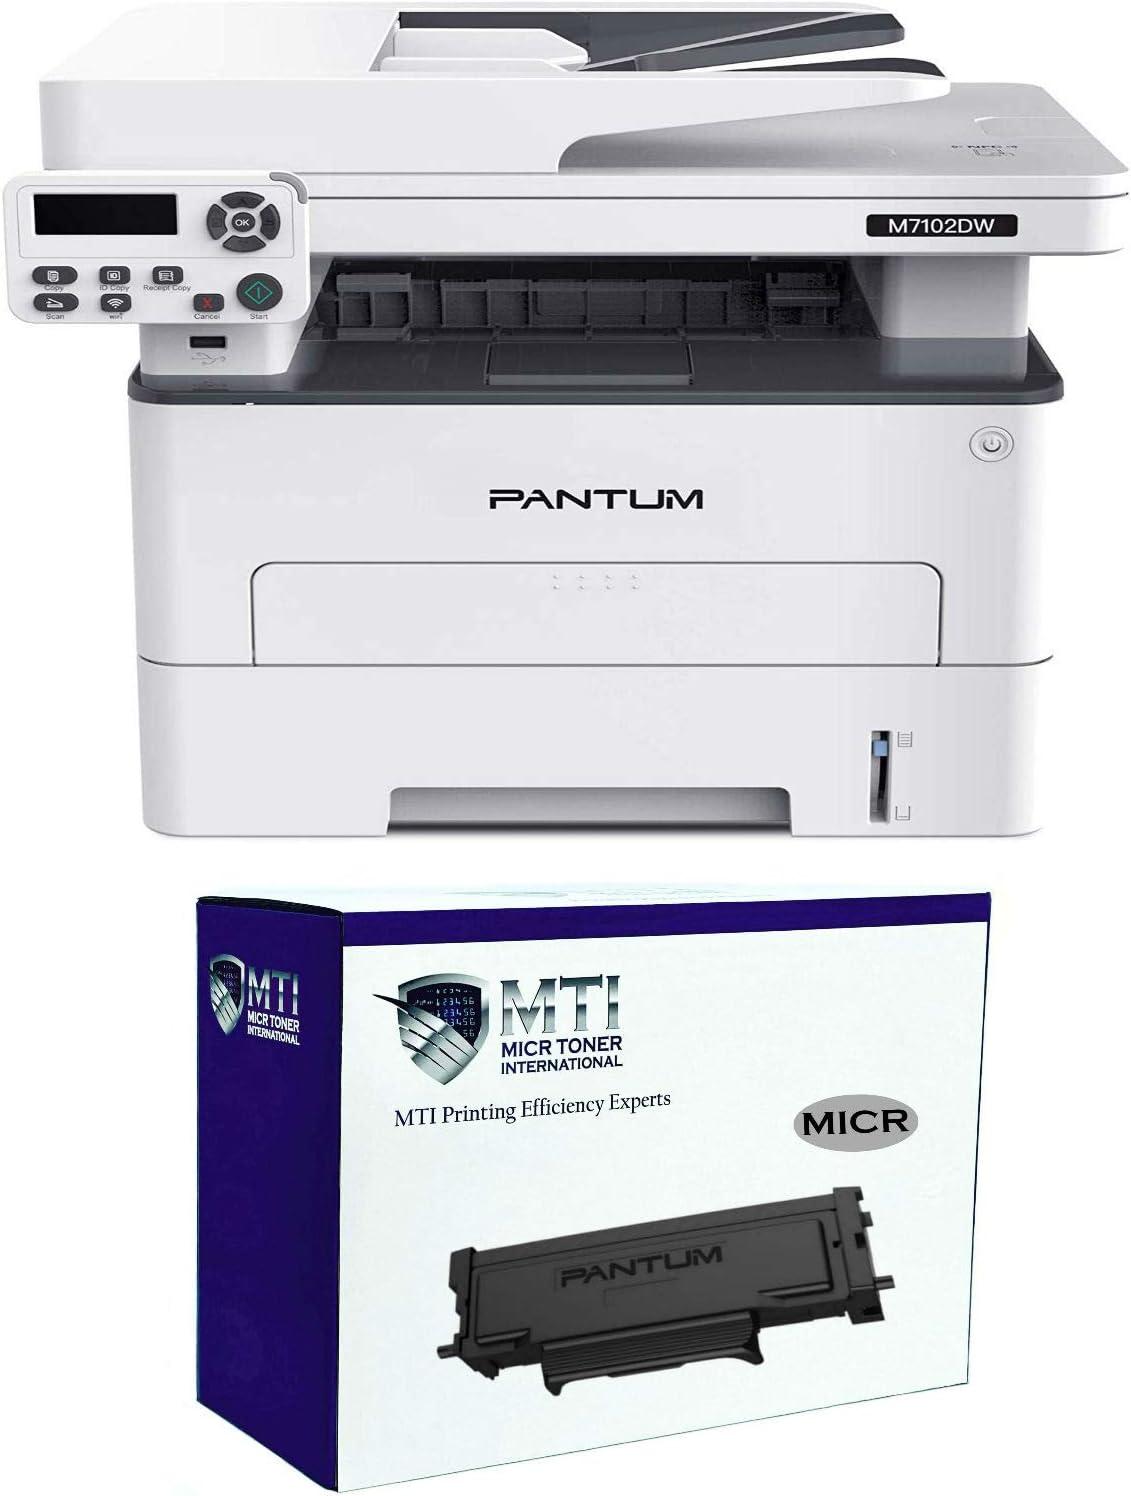 2 Items MICR Toner International M7102DW MICR Check Printer Bundle with 1 Pantum TL-410A MICR Starter Toner Cartridge